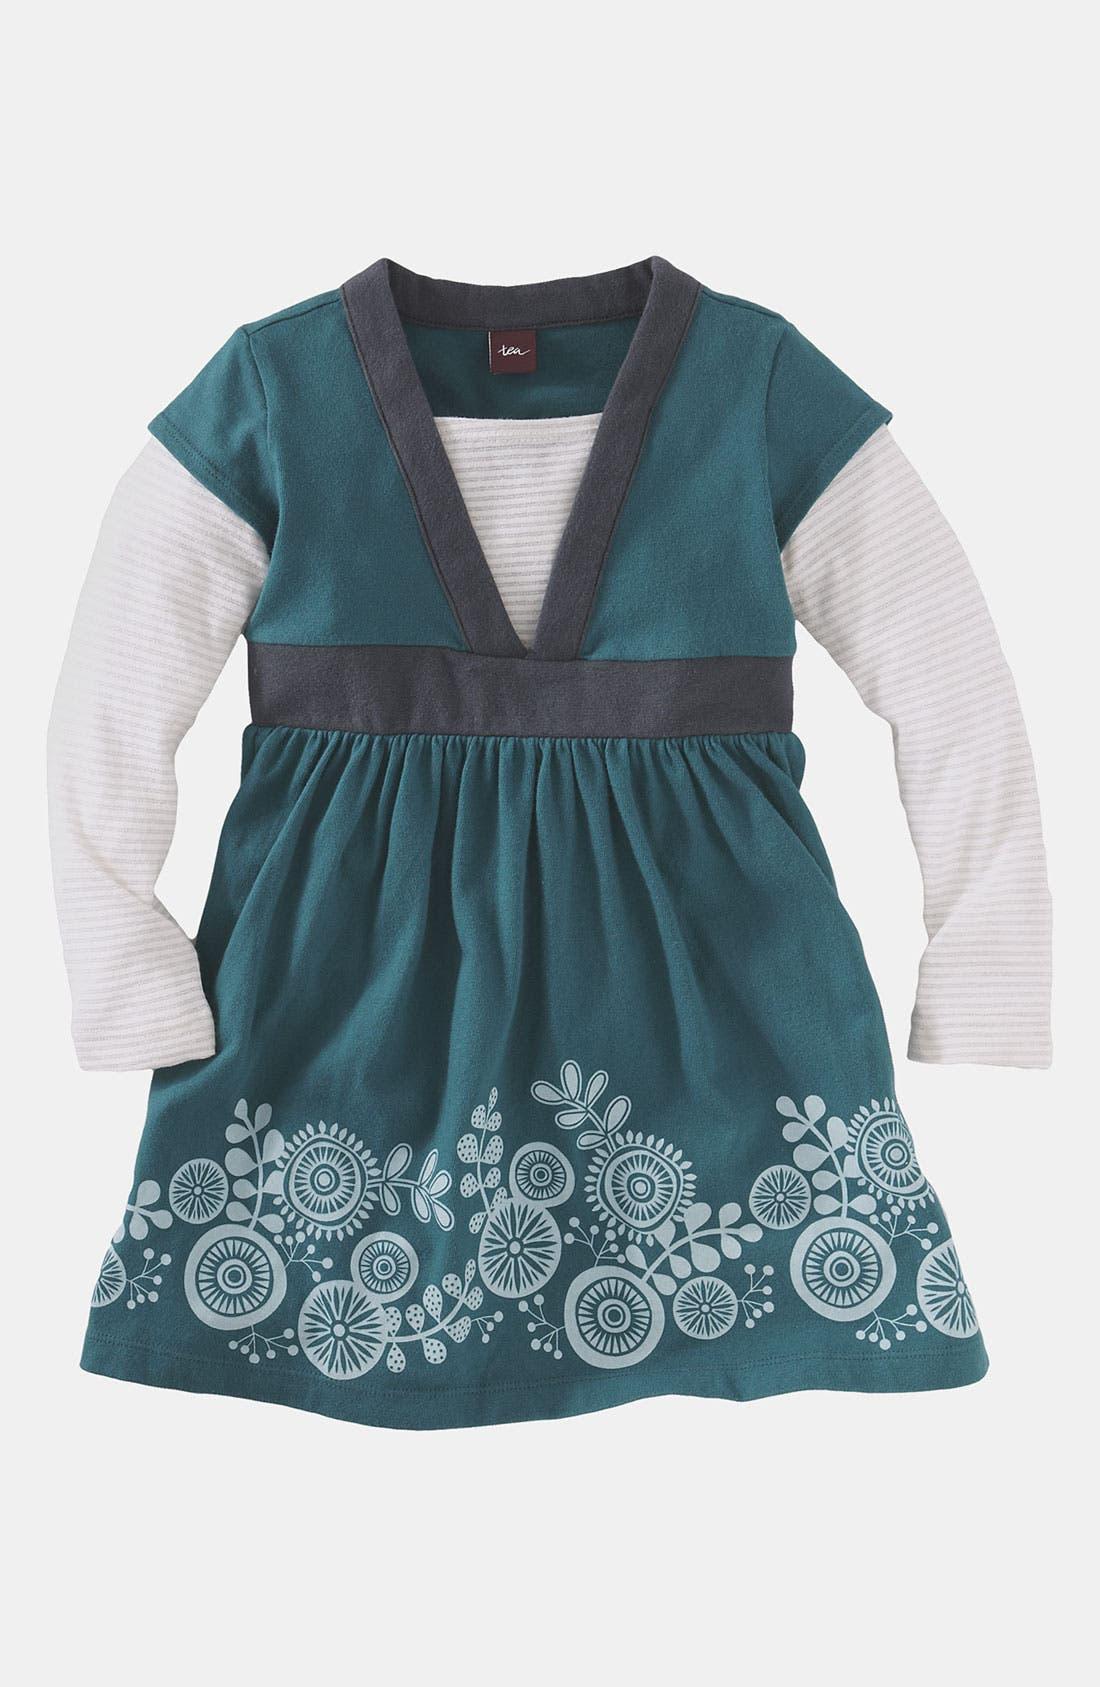 Alternate Image 1 Selected - Tea Collection 'Pinwheel' Layered Sleeve Dress (Toddler)